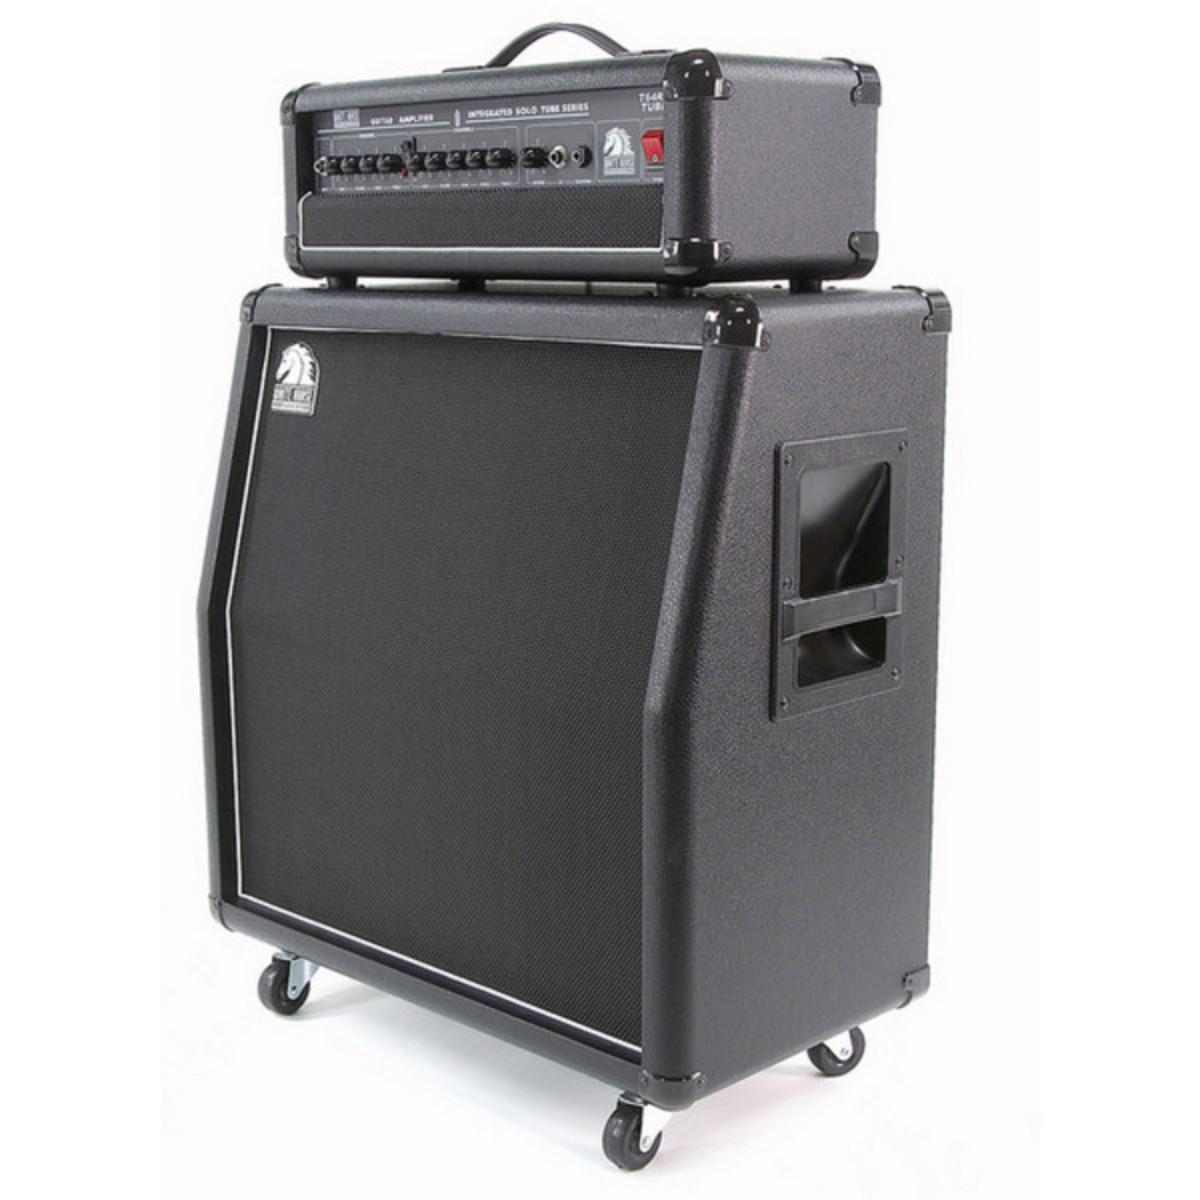 white horse 60w tube guitar amp 4x8 cab at gear4music rh gear4music com rocket 60w rms guitar amplifier 60w guitar amp